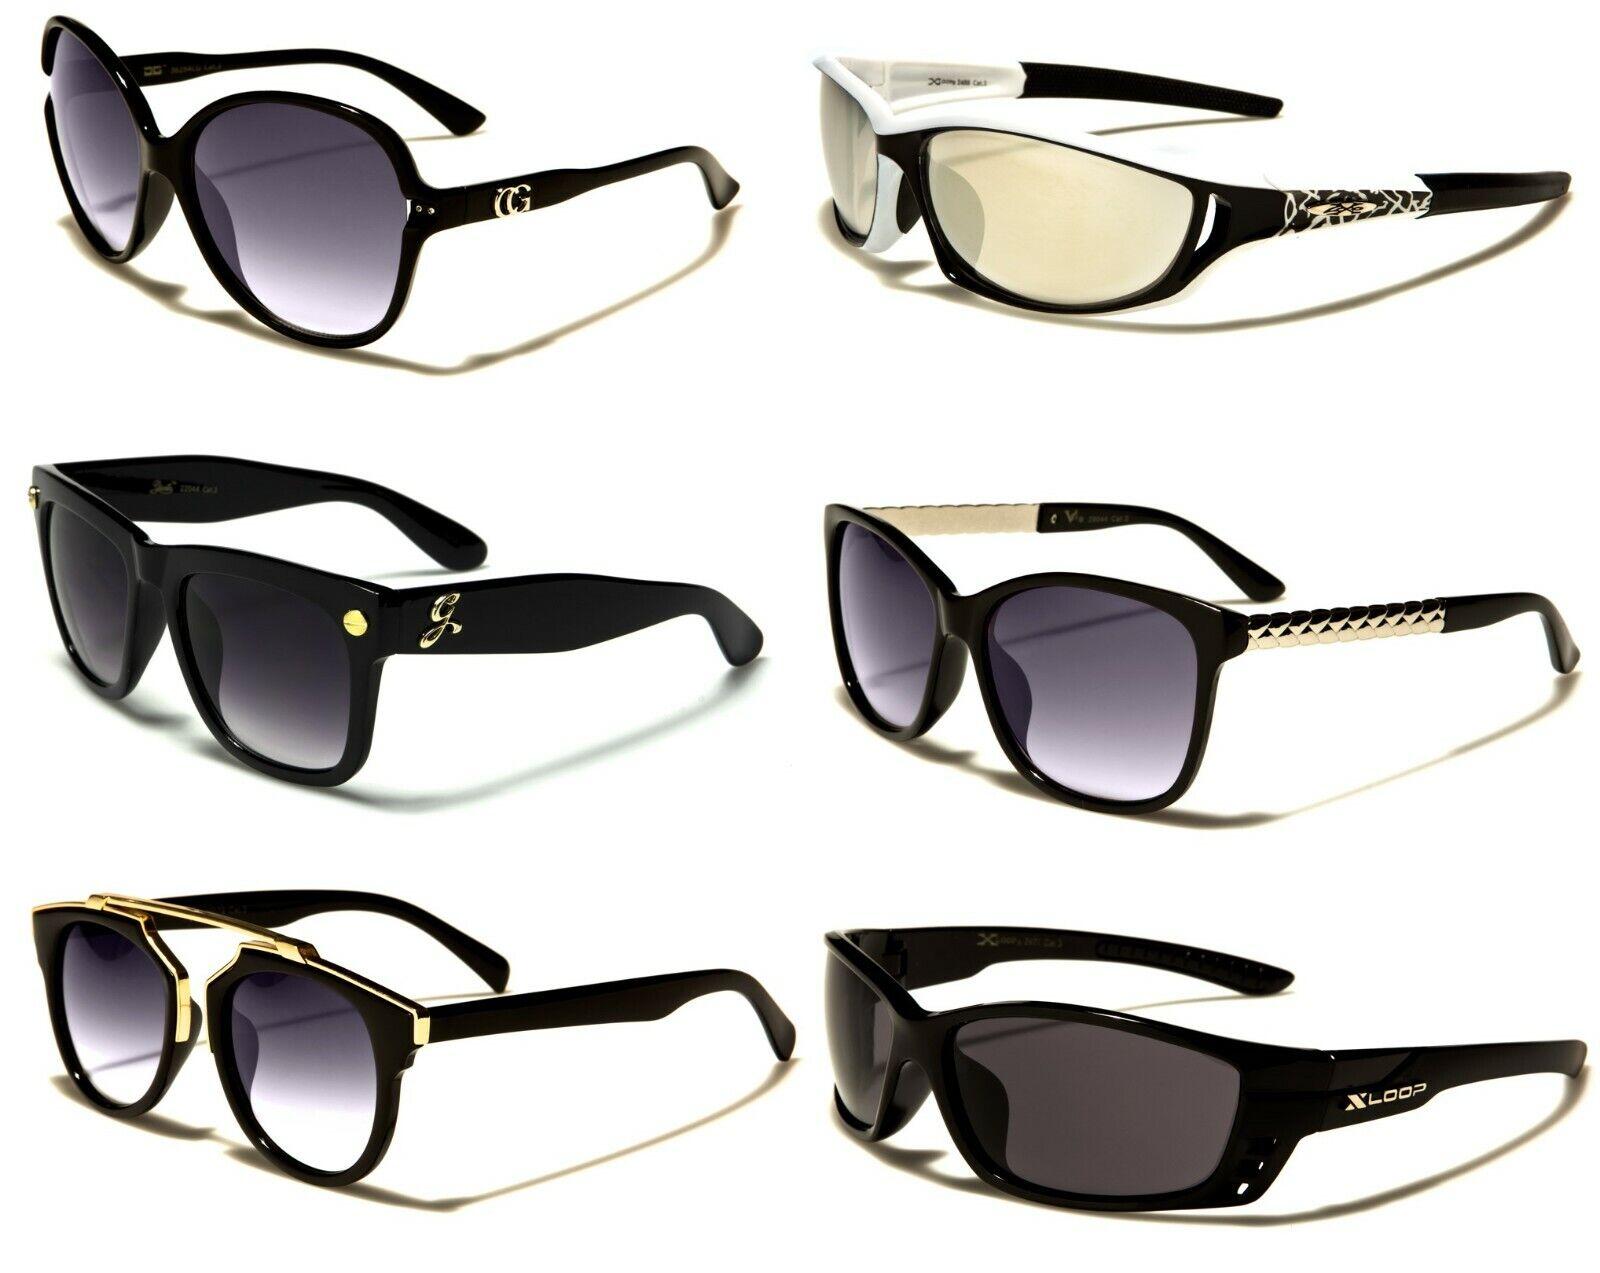 10x New Men Women Sport Square Xloop Giselle Wrap Black Blue UV400 Sunglasses 05